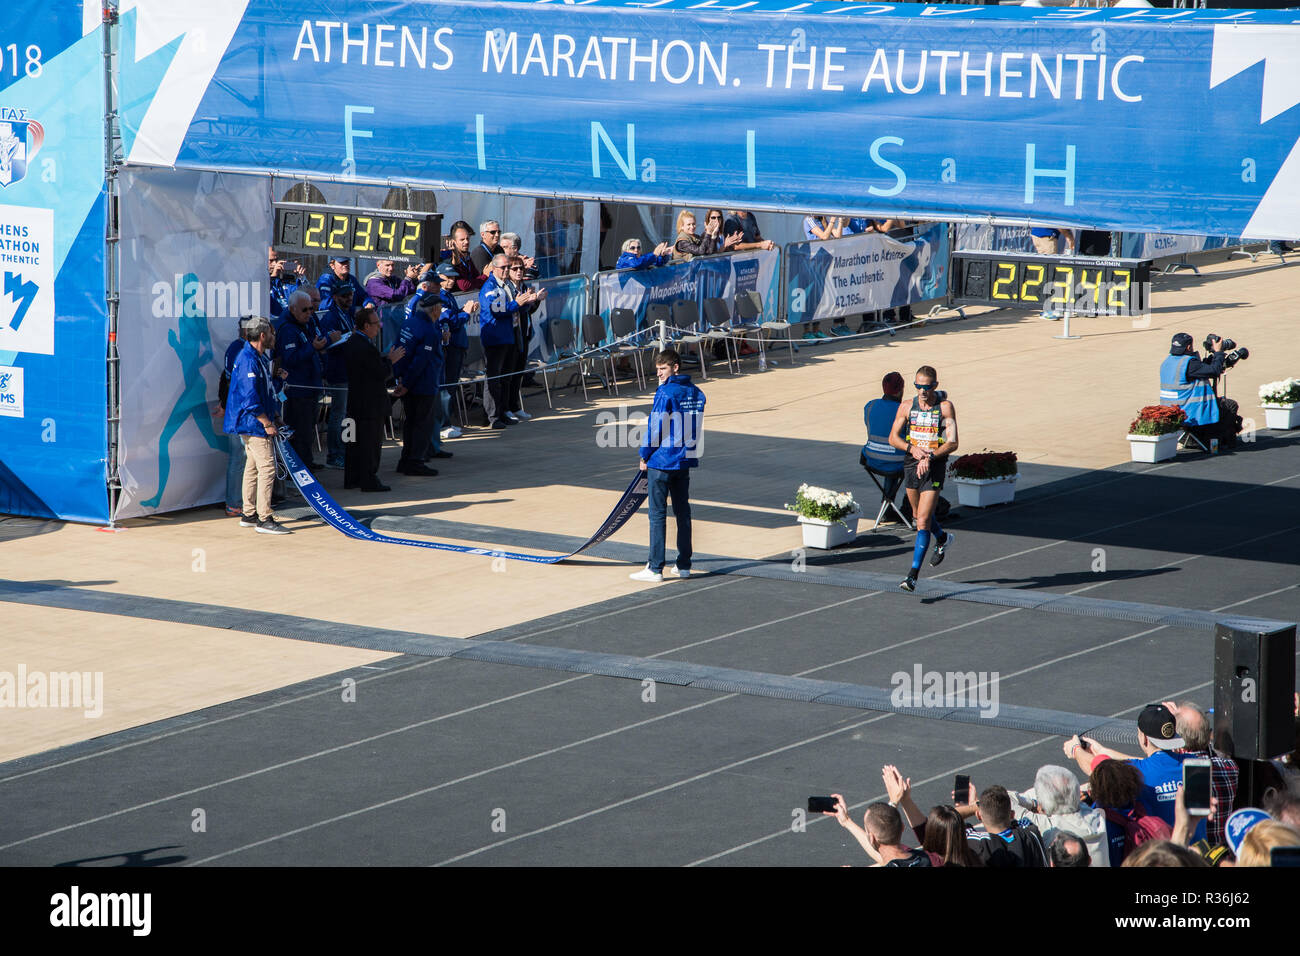 36th Athens Authentic Marathon. Christoforos Merousis crossing 2nd of the Panhellinic Championship at Panathenaic stadium Stock Photo